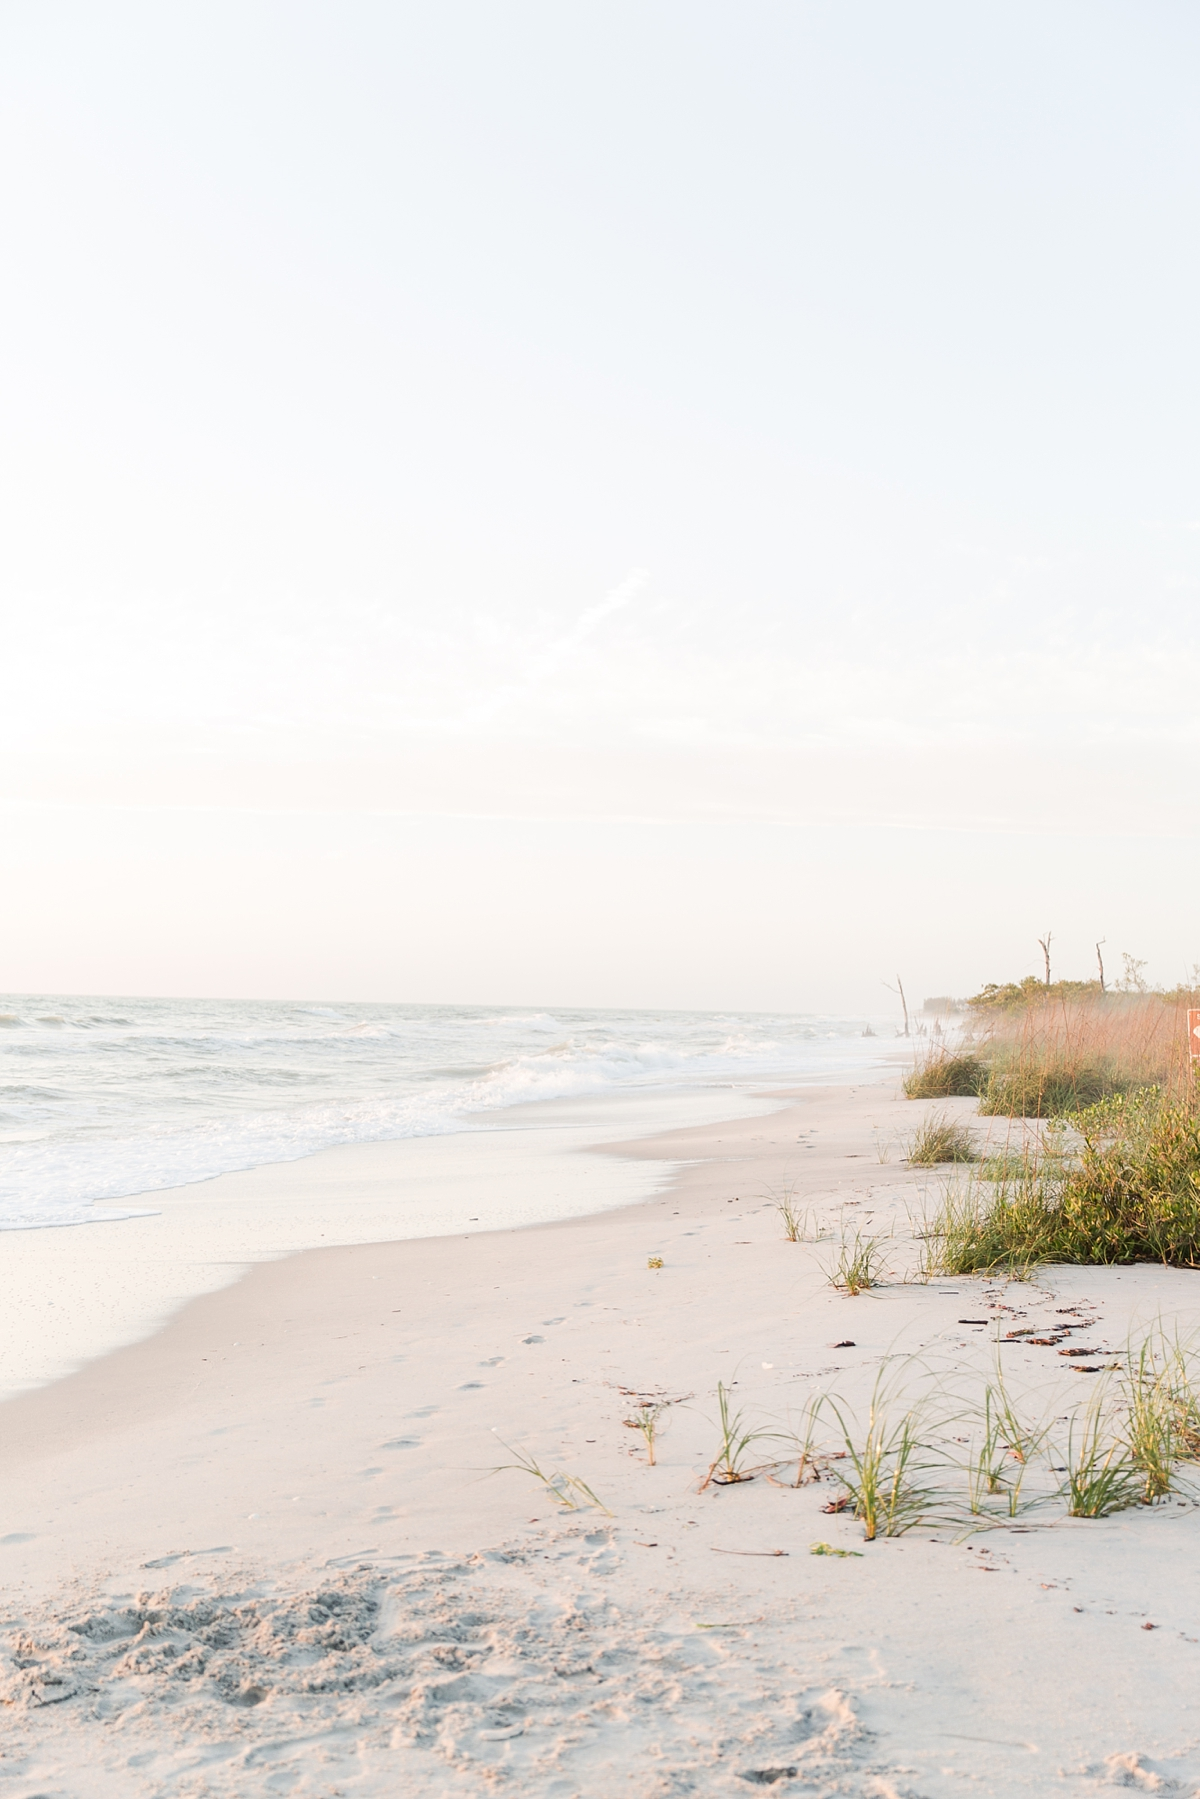 Gasparilla Island Vacation Rentals Florida Beach House_7784